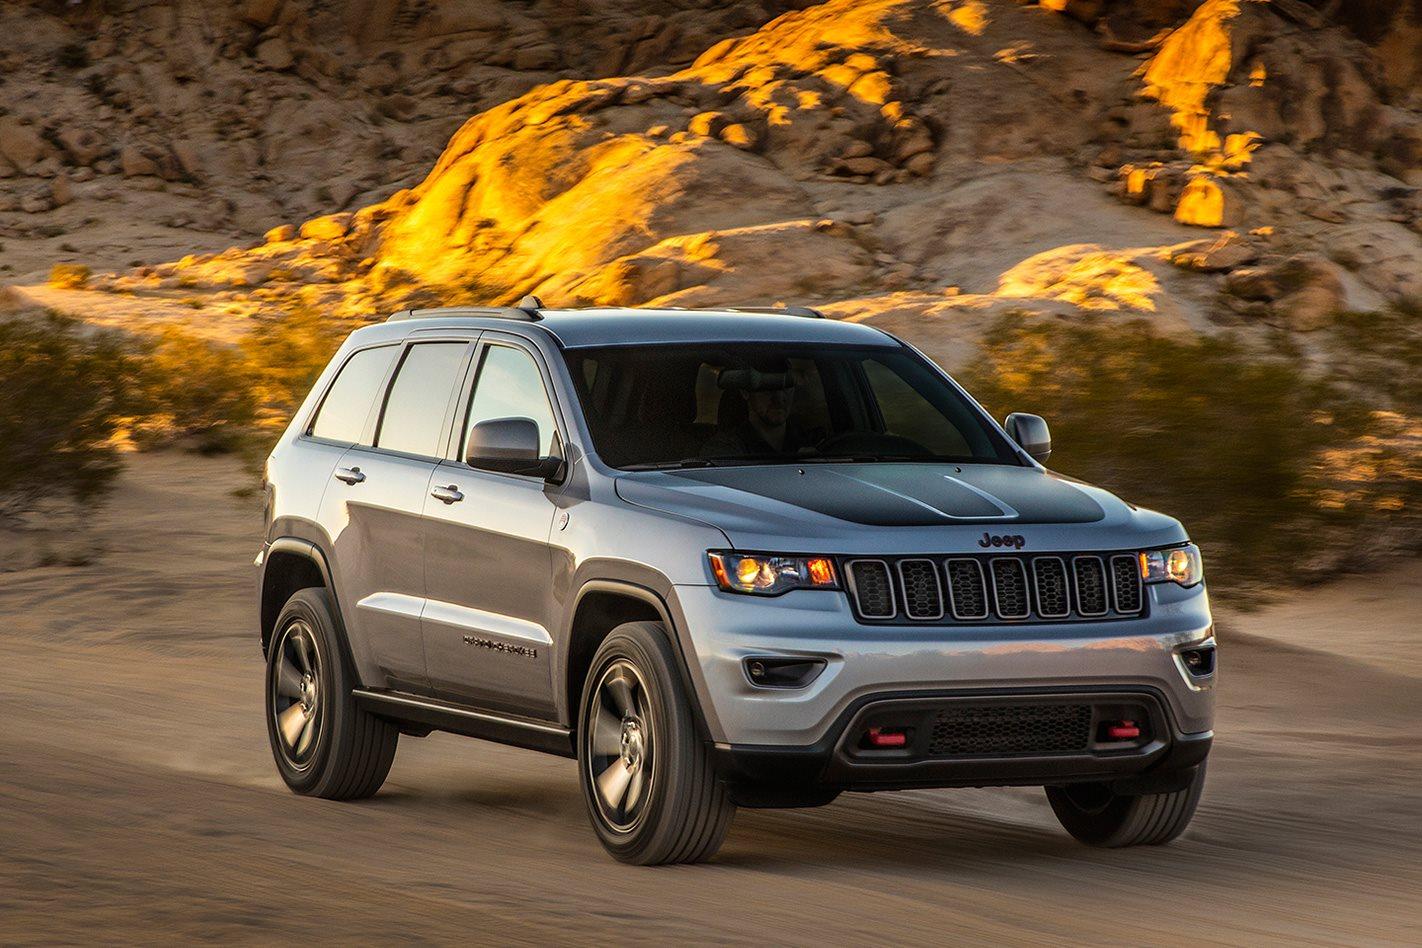 2017 Jeep Grand Cherokee Trailhawk review | 4X4 Australia